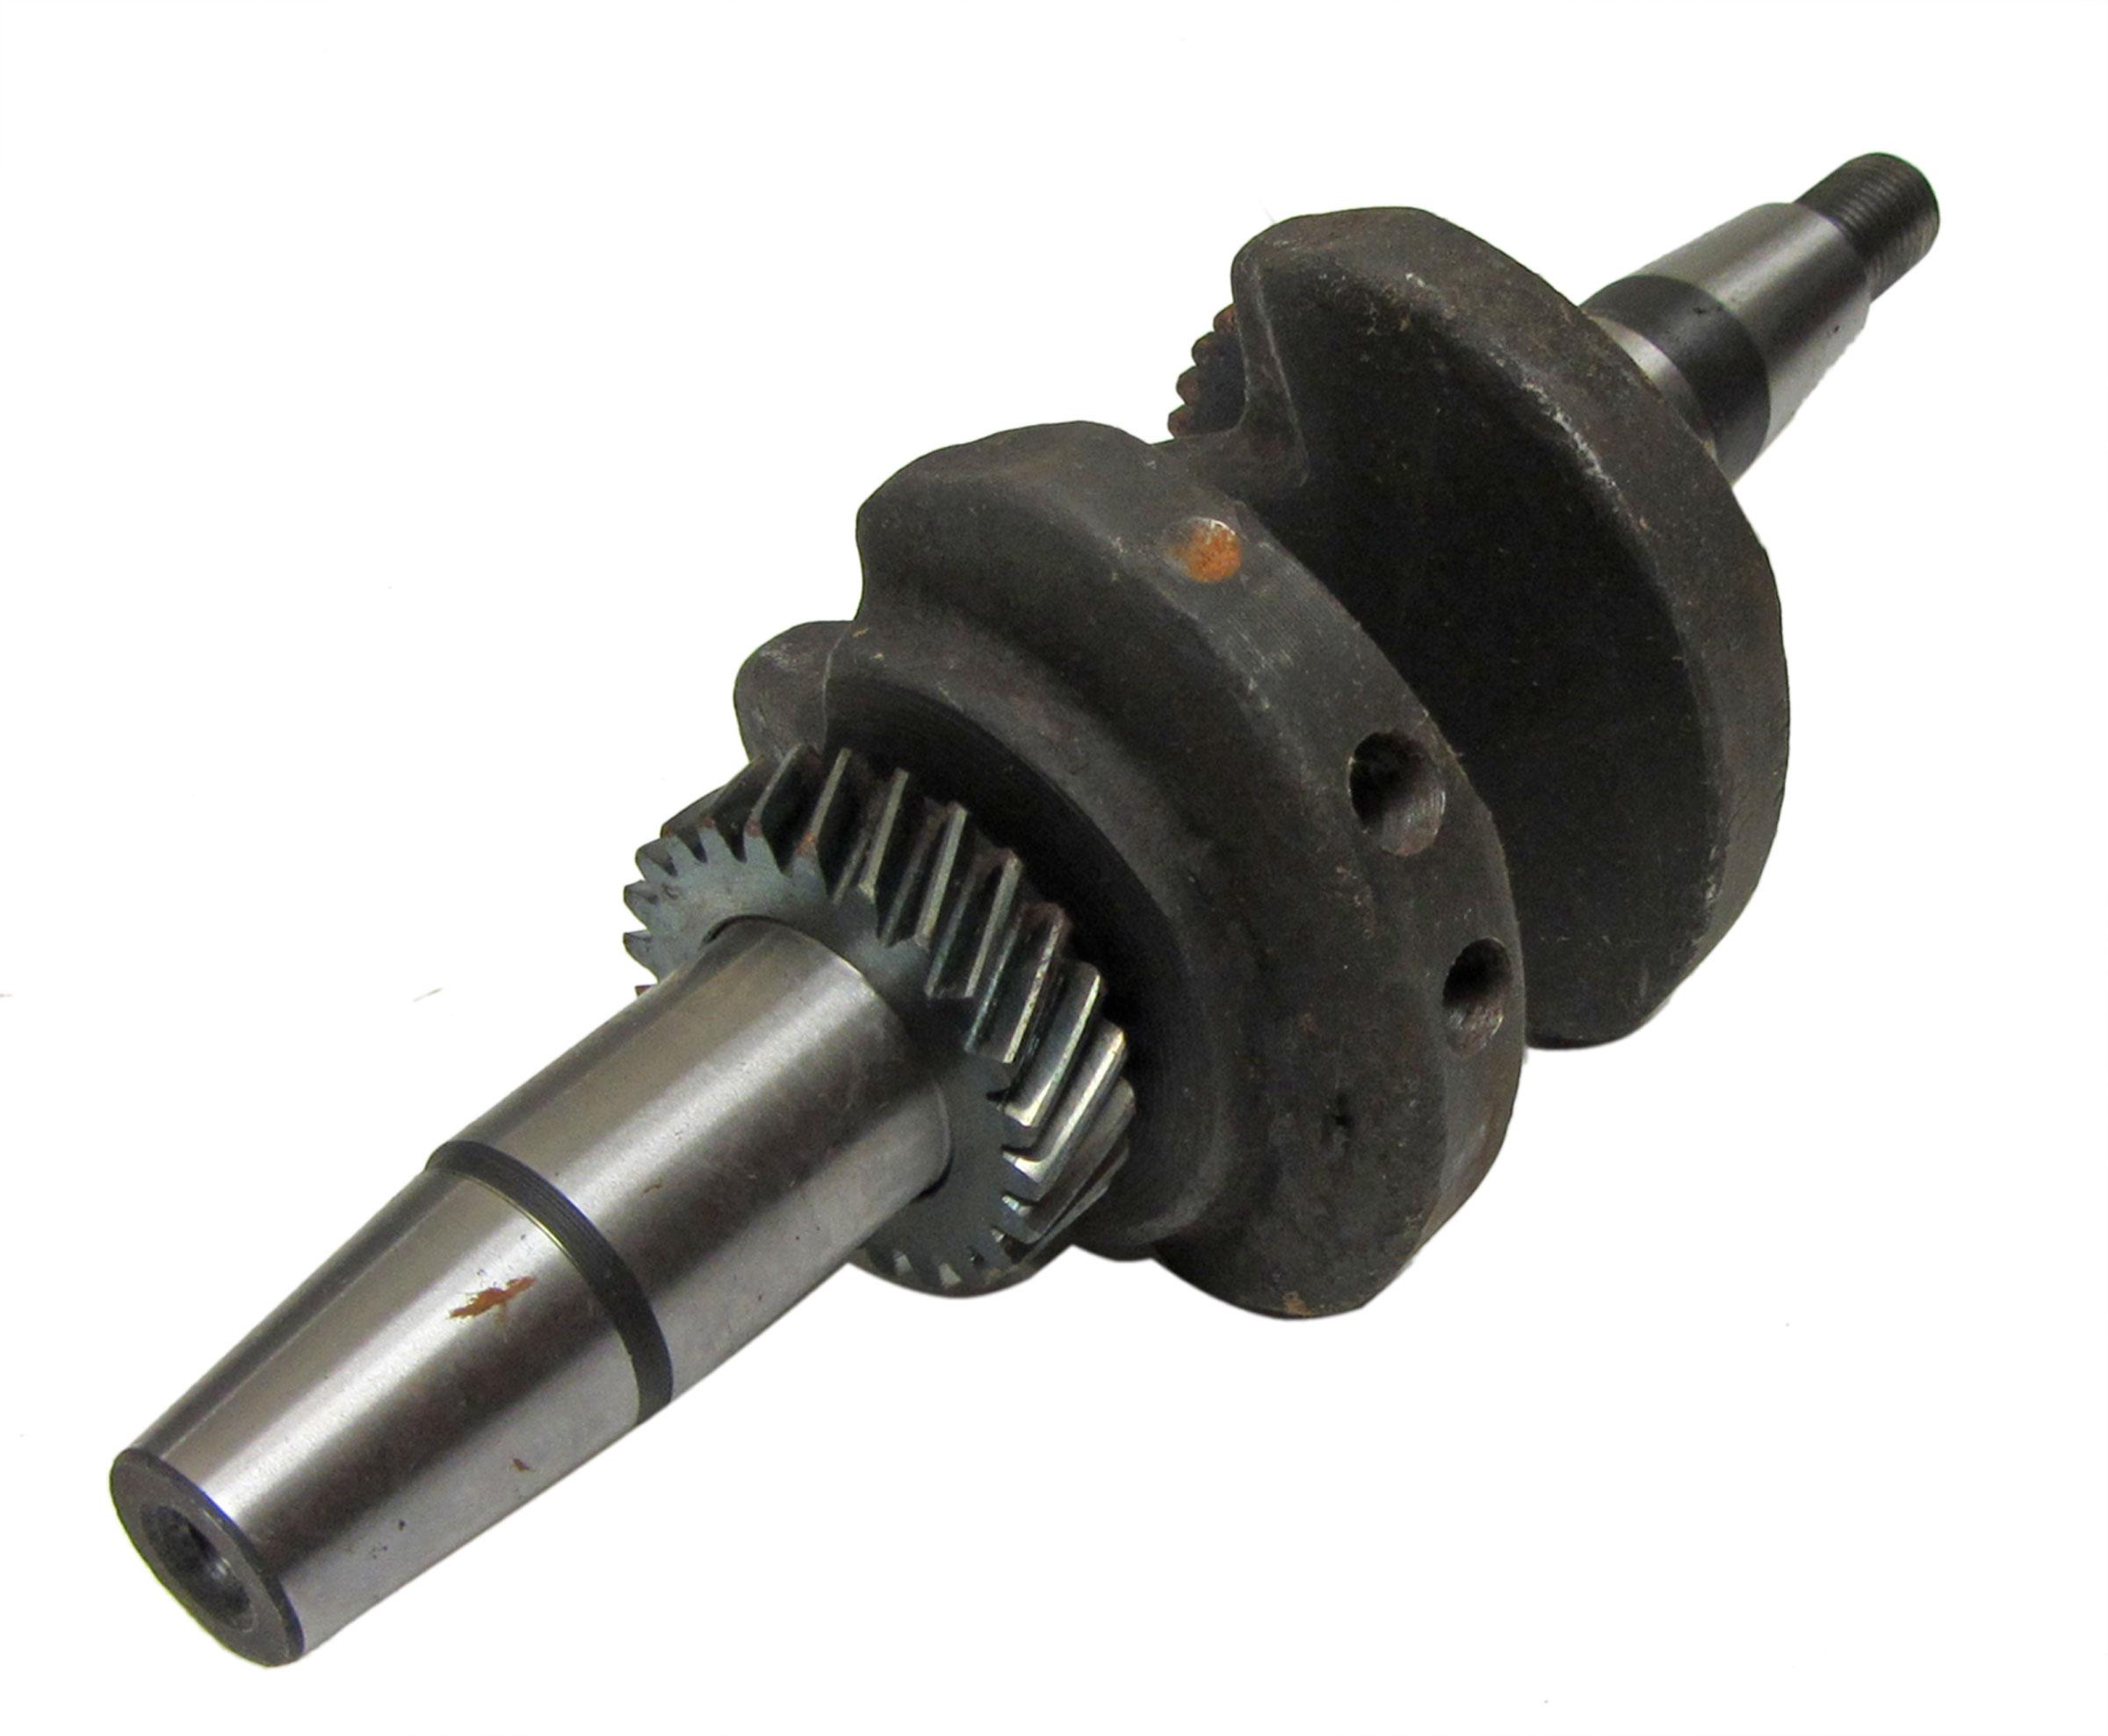 Crankshaft for 6 5HP Clone Honda GX200 Gas Engine Motor Type E Tapered New